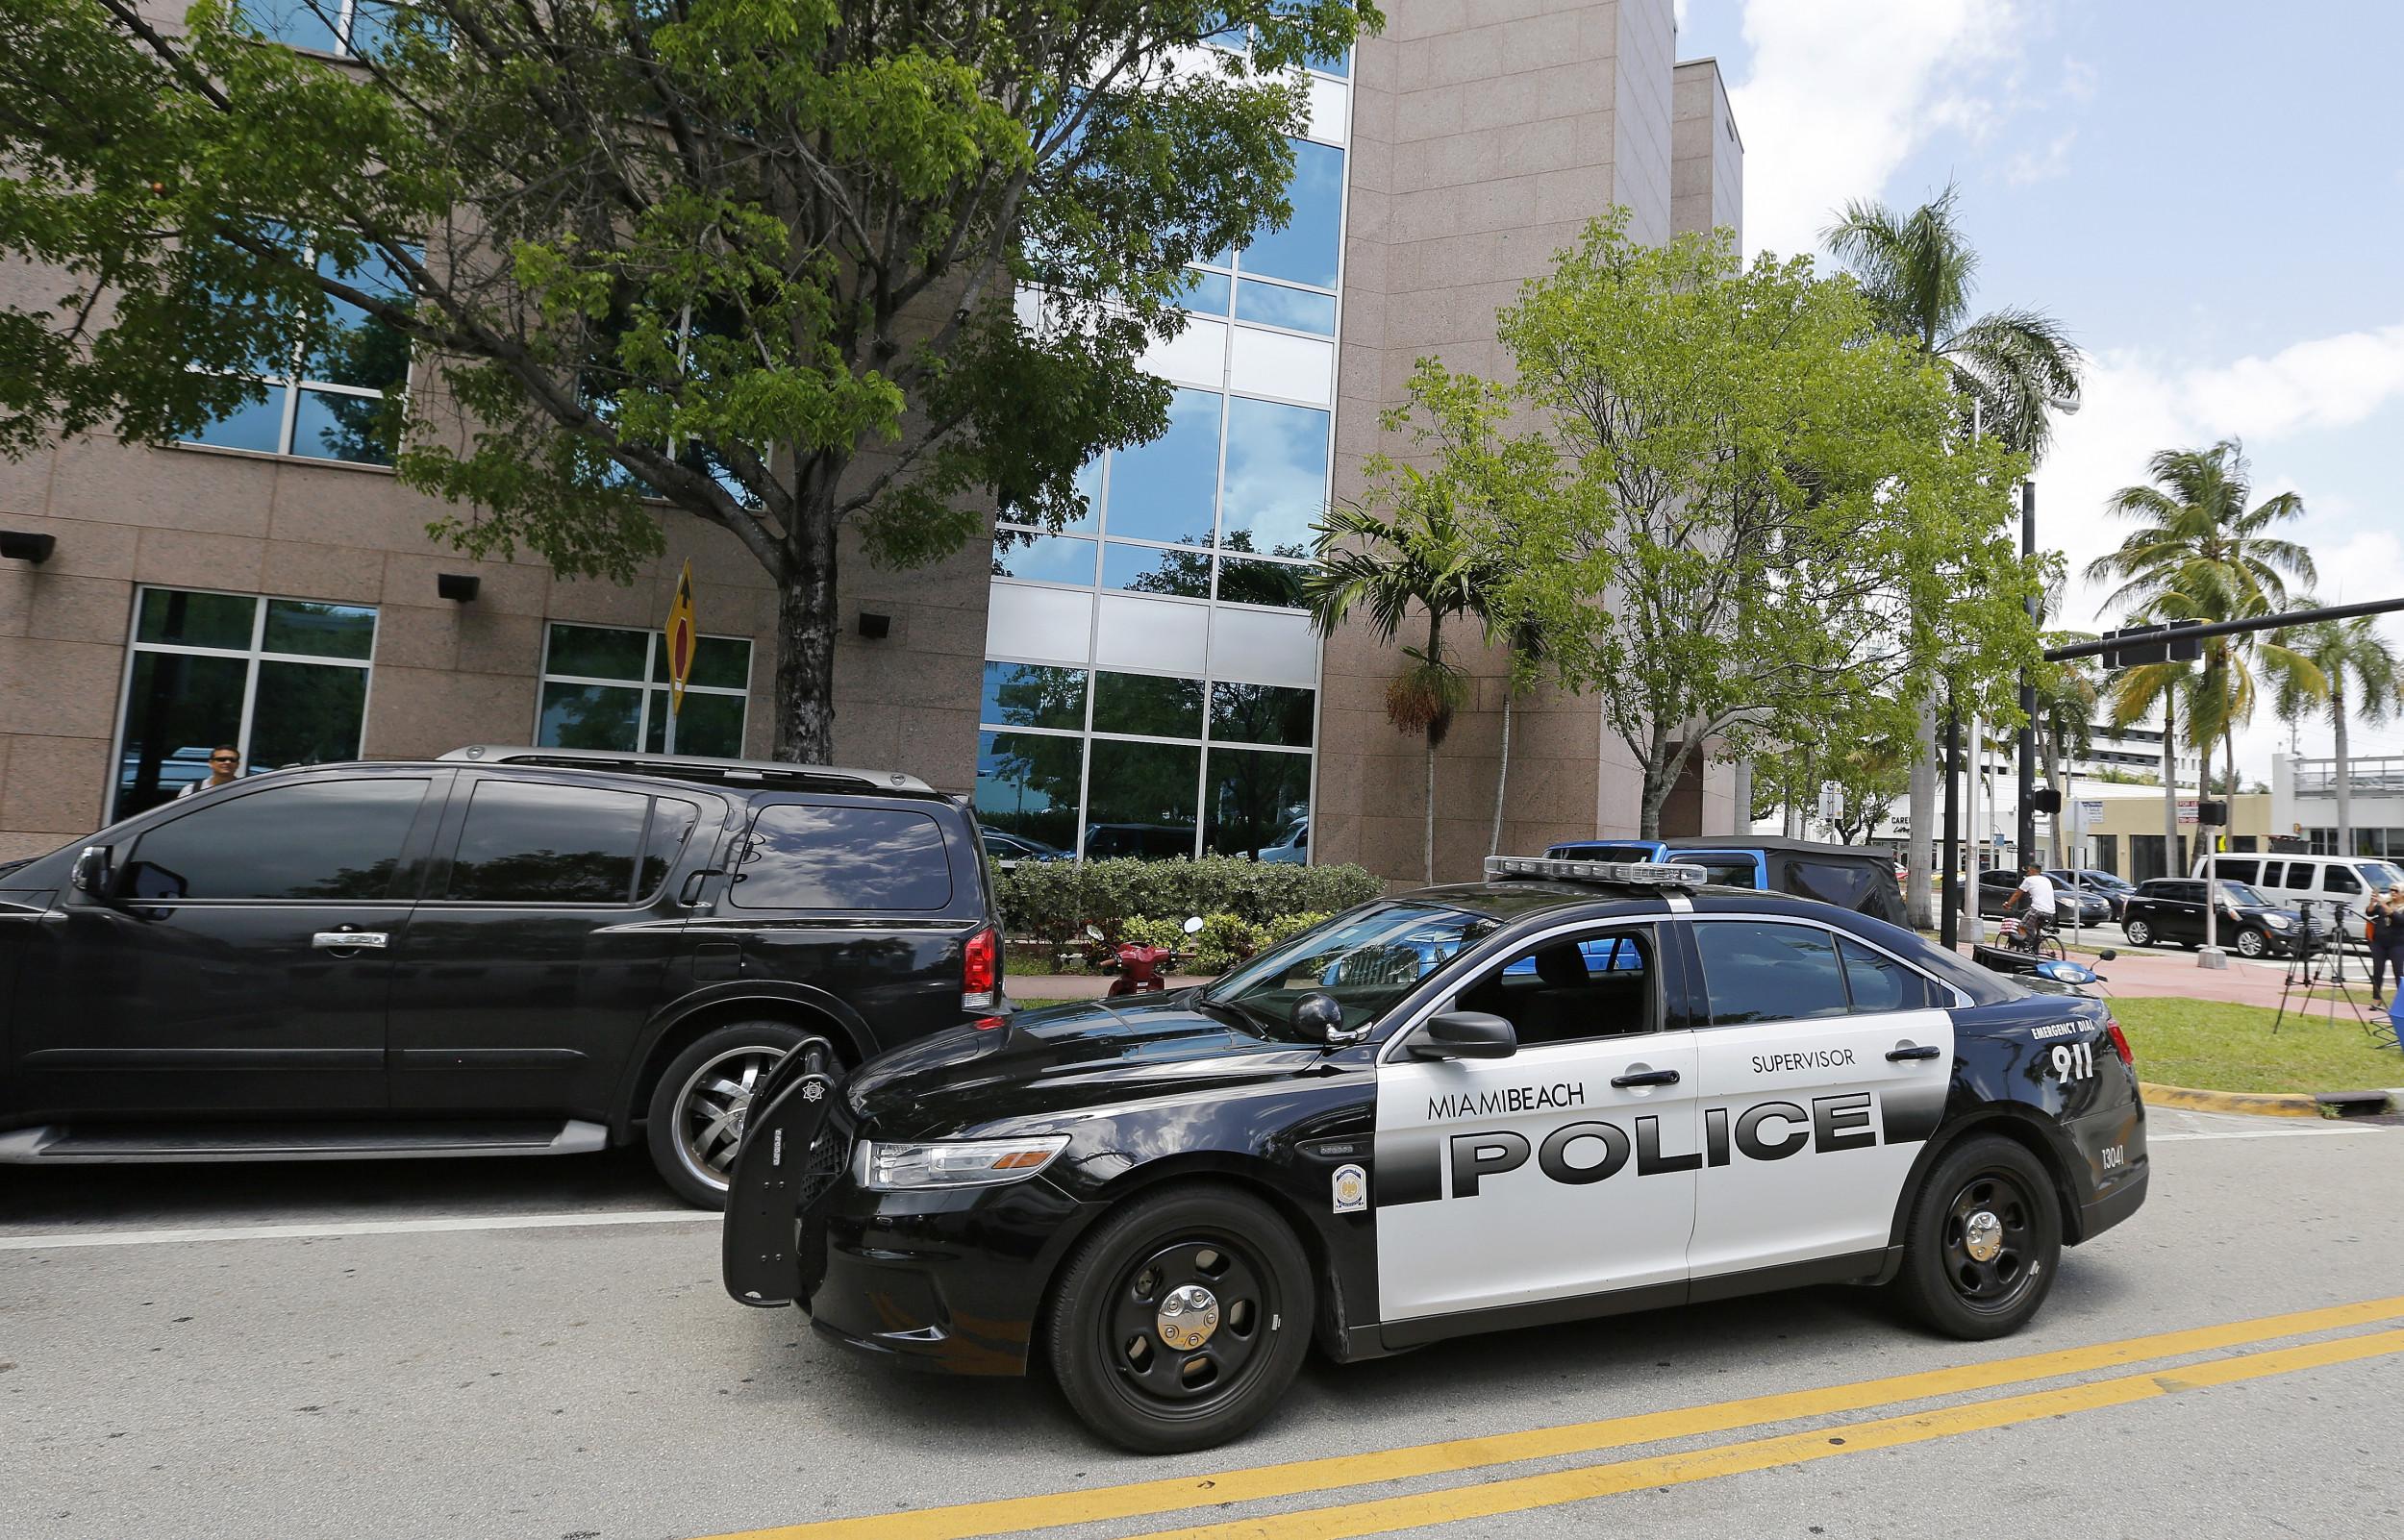 Miami Gardens police